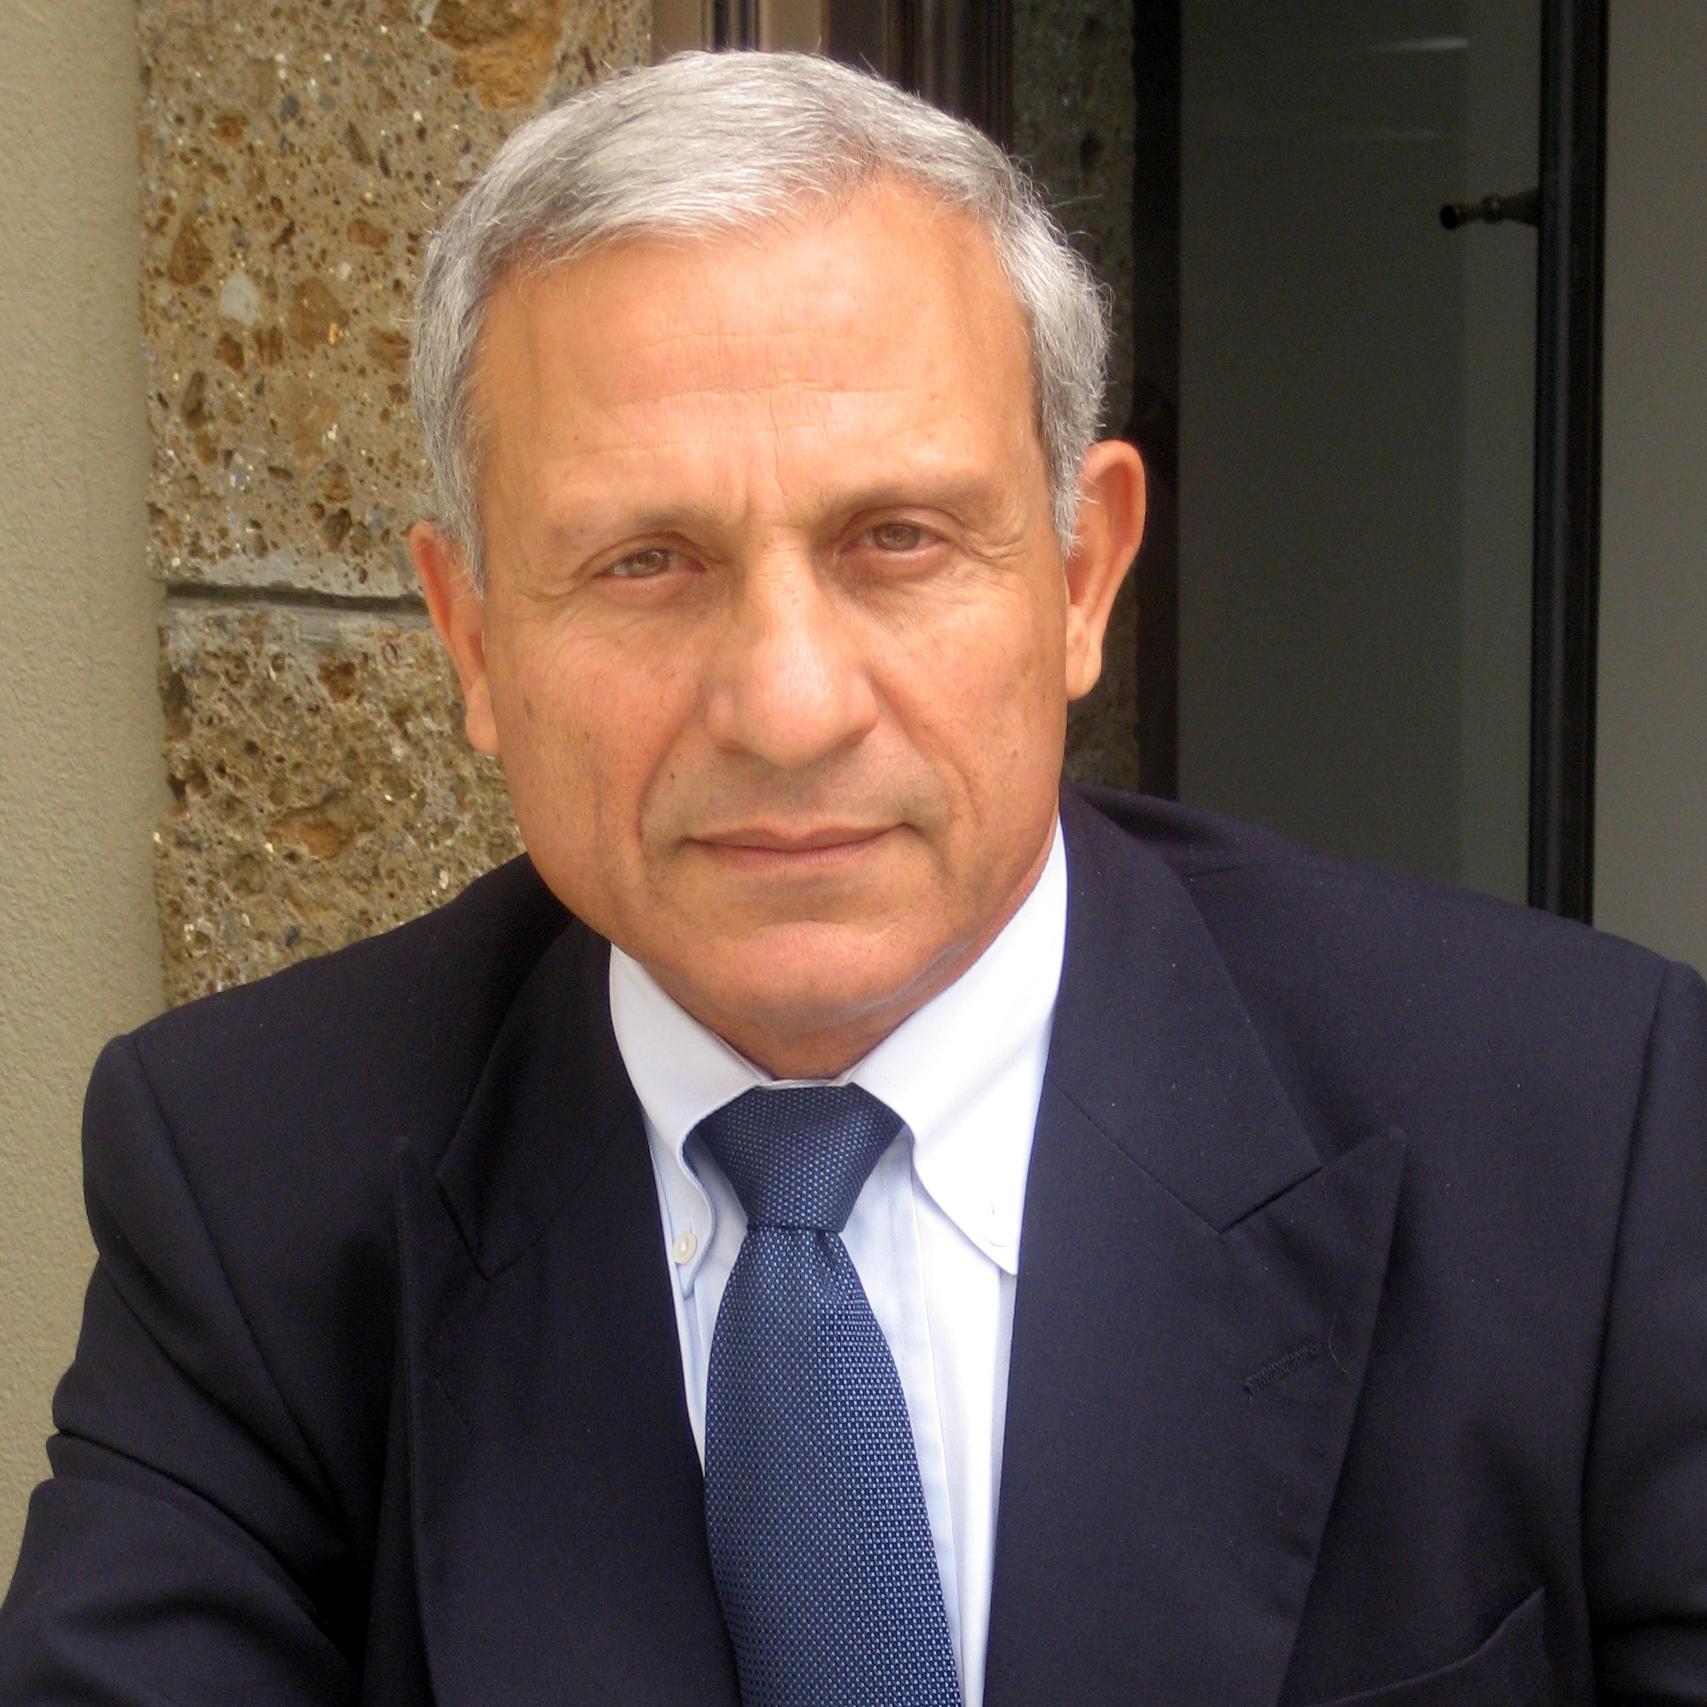 Major-General (Res.) Eitan Ben-Eliahu, Israeli Air Force